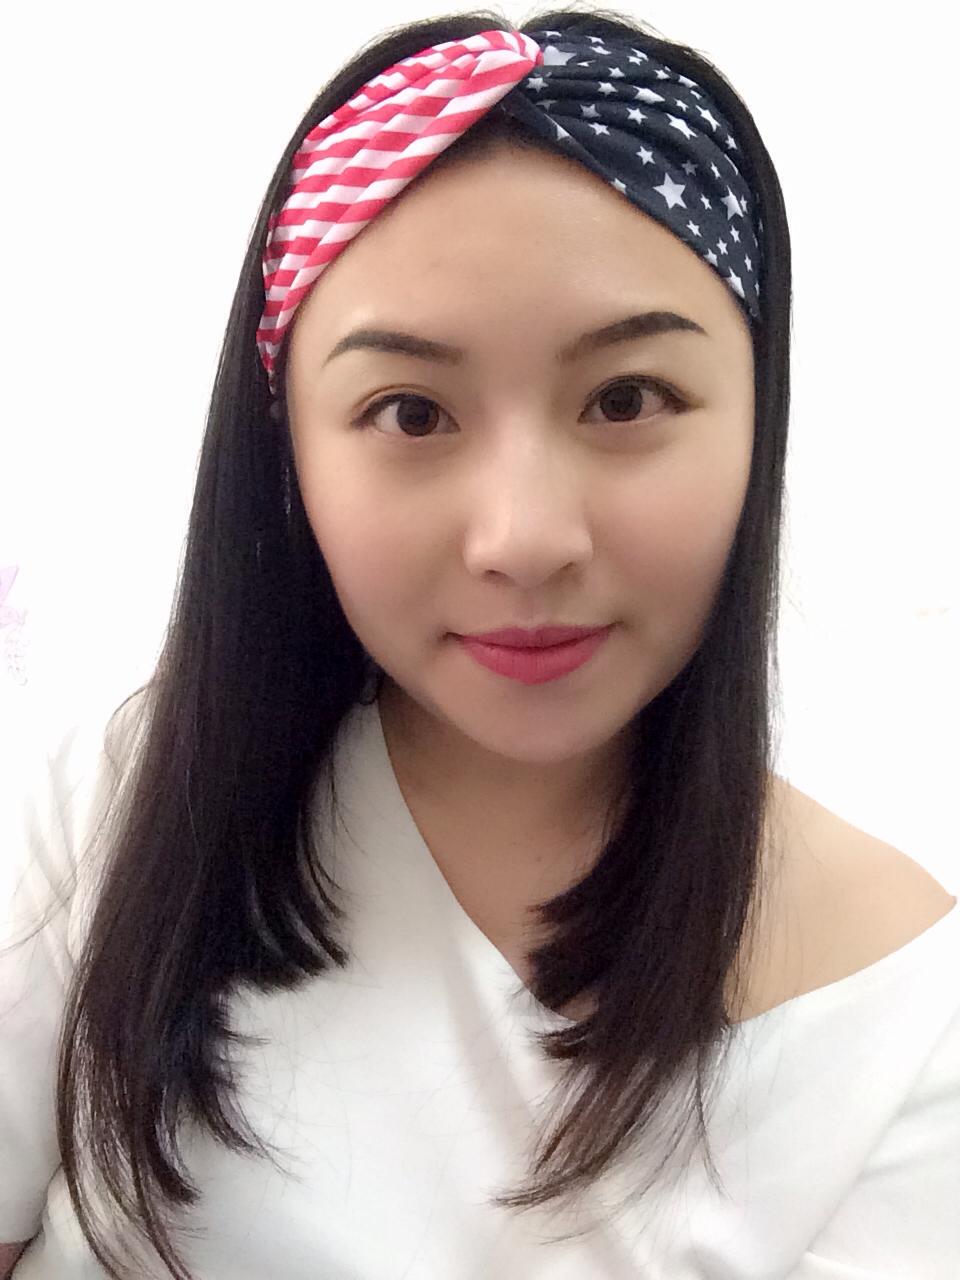 American Flag Headband USA Hair Band Red White Black Fashion women hair Accessory girl Turban head wrap Classic - Topbabyhouse store